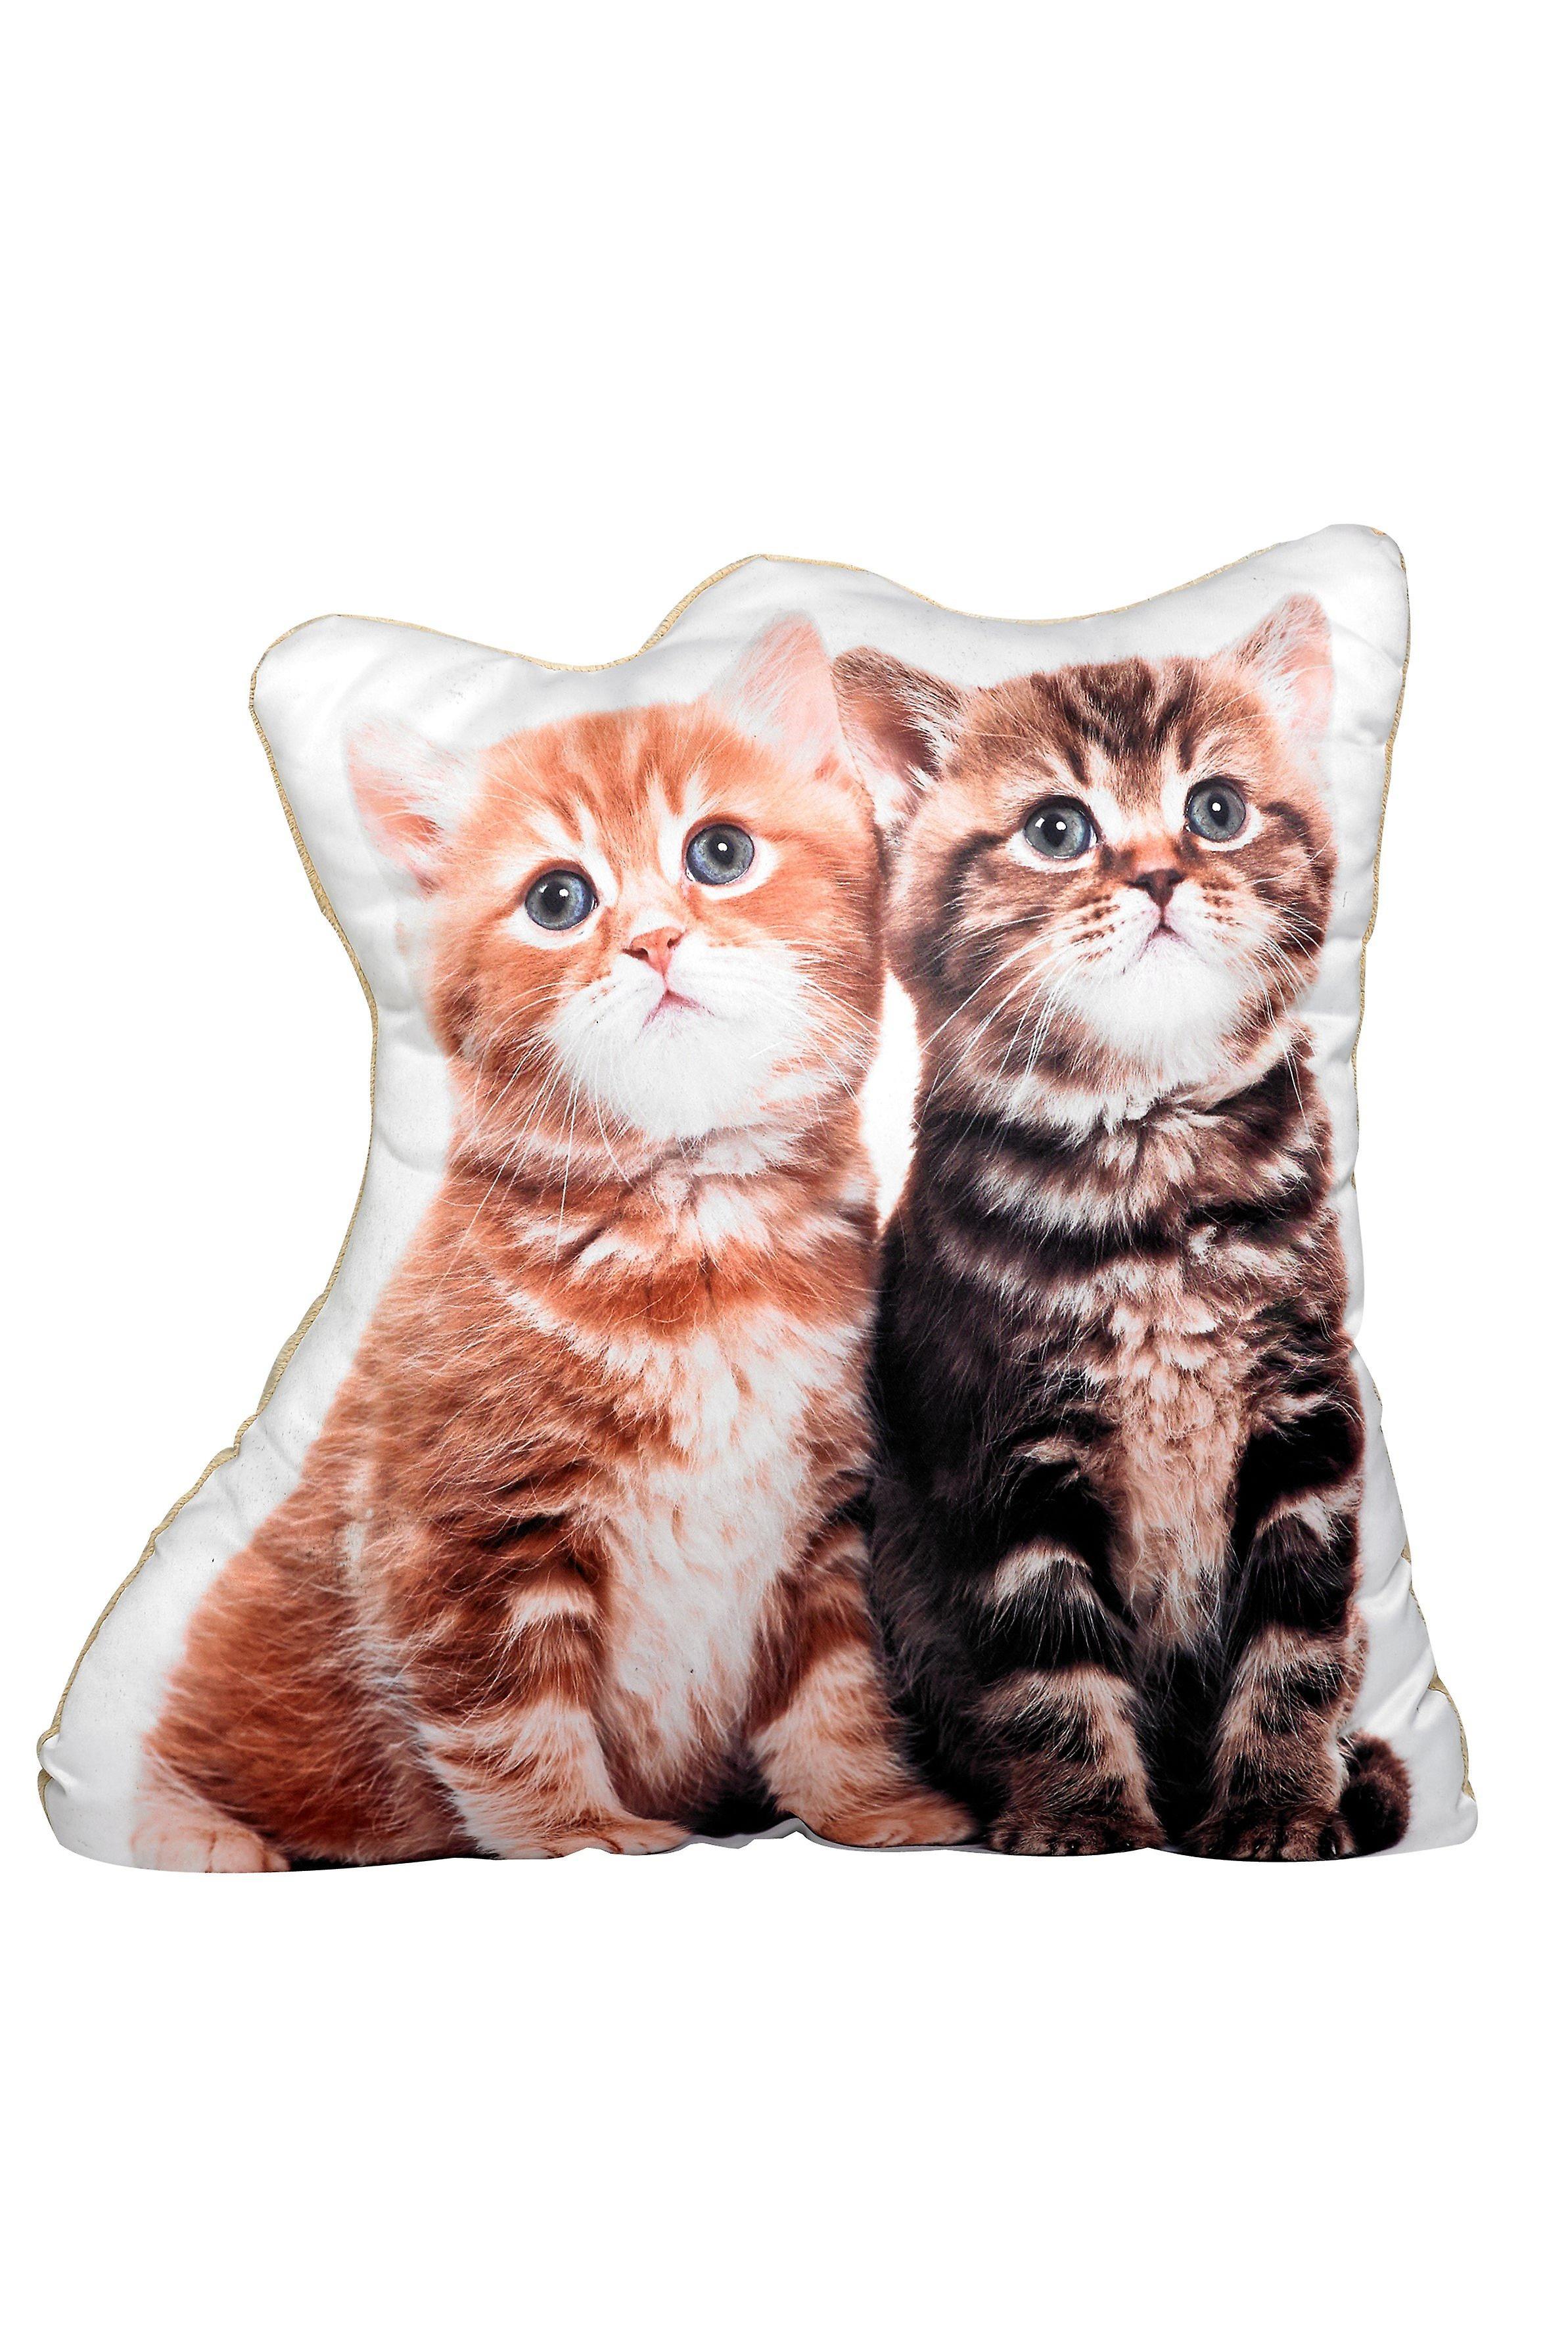 Adorable kitten shaped cushion